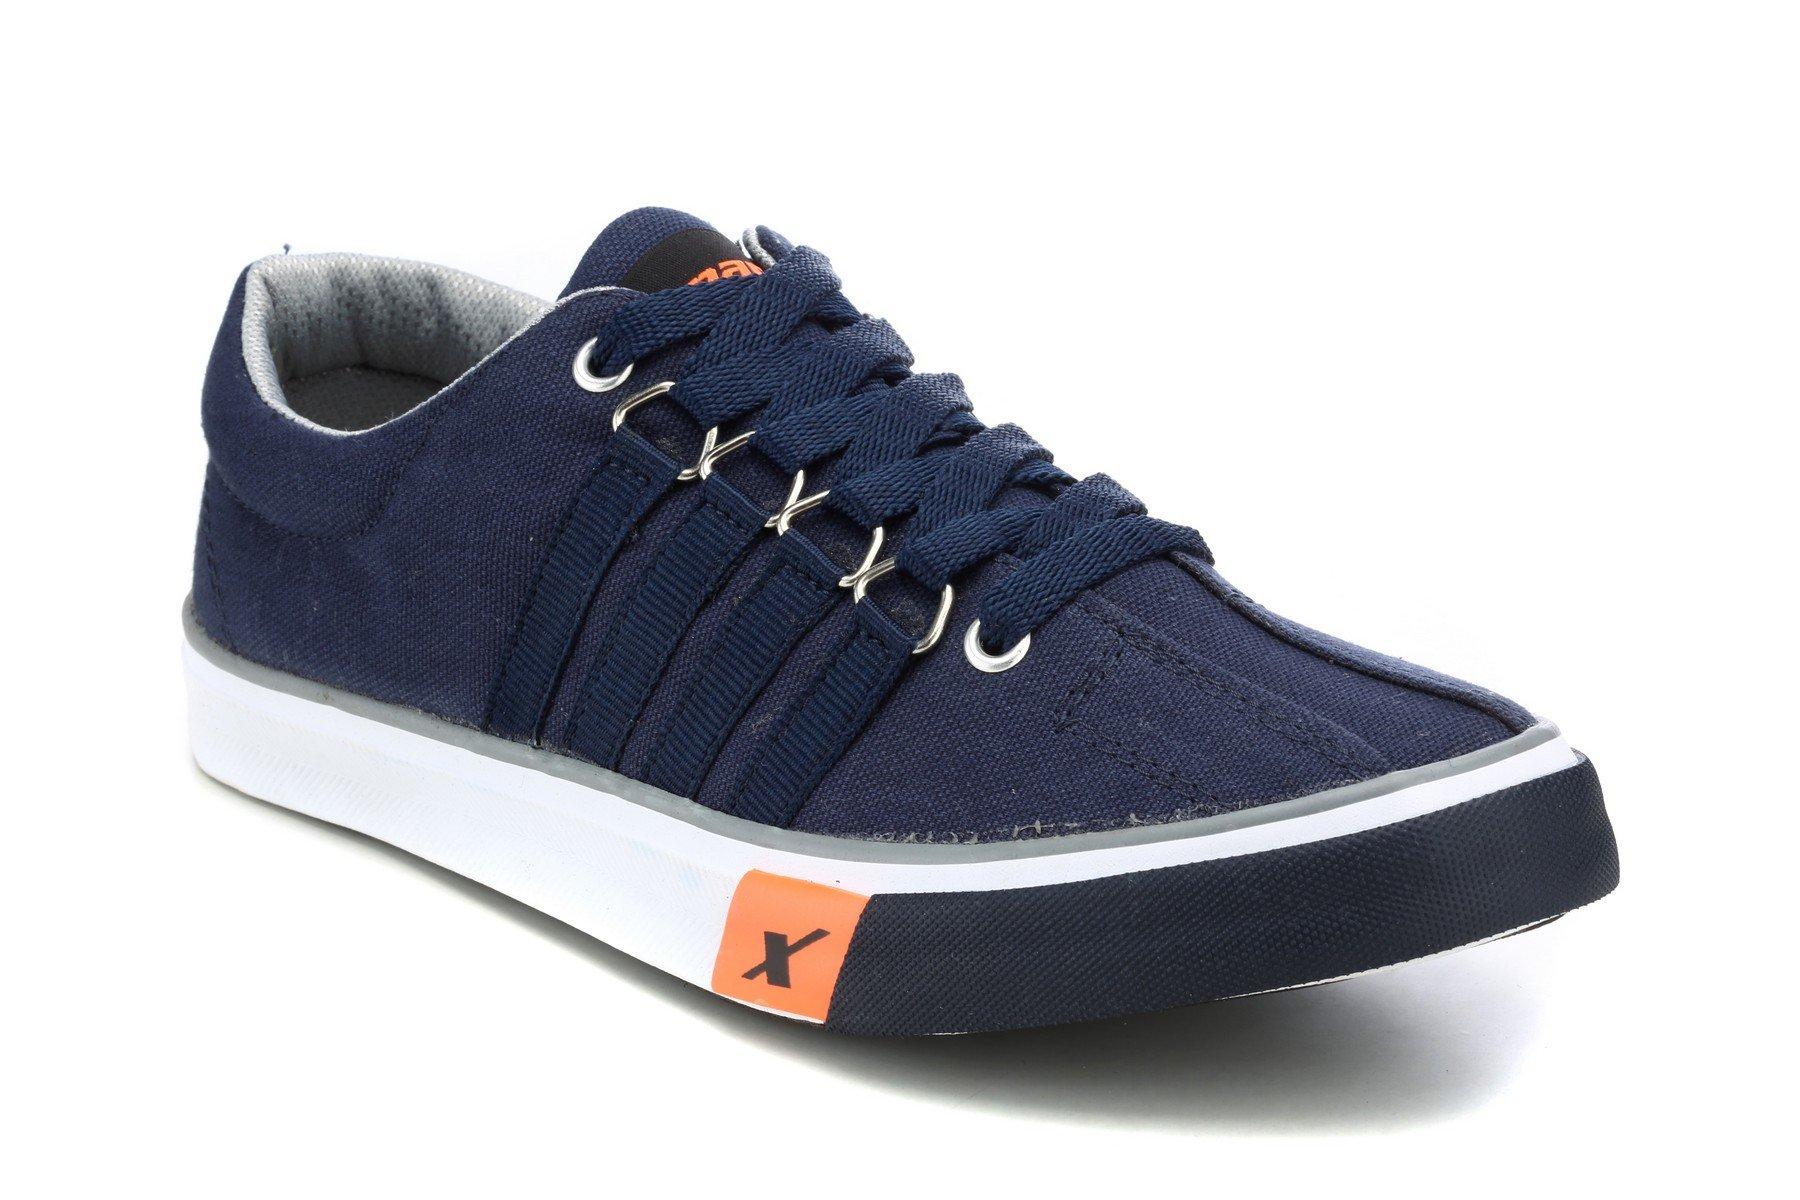 1. Sparx Men's Canvas Sneakers